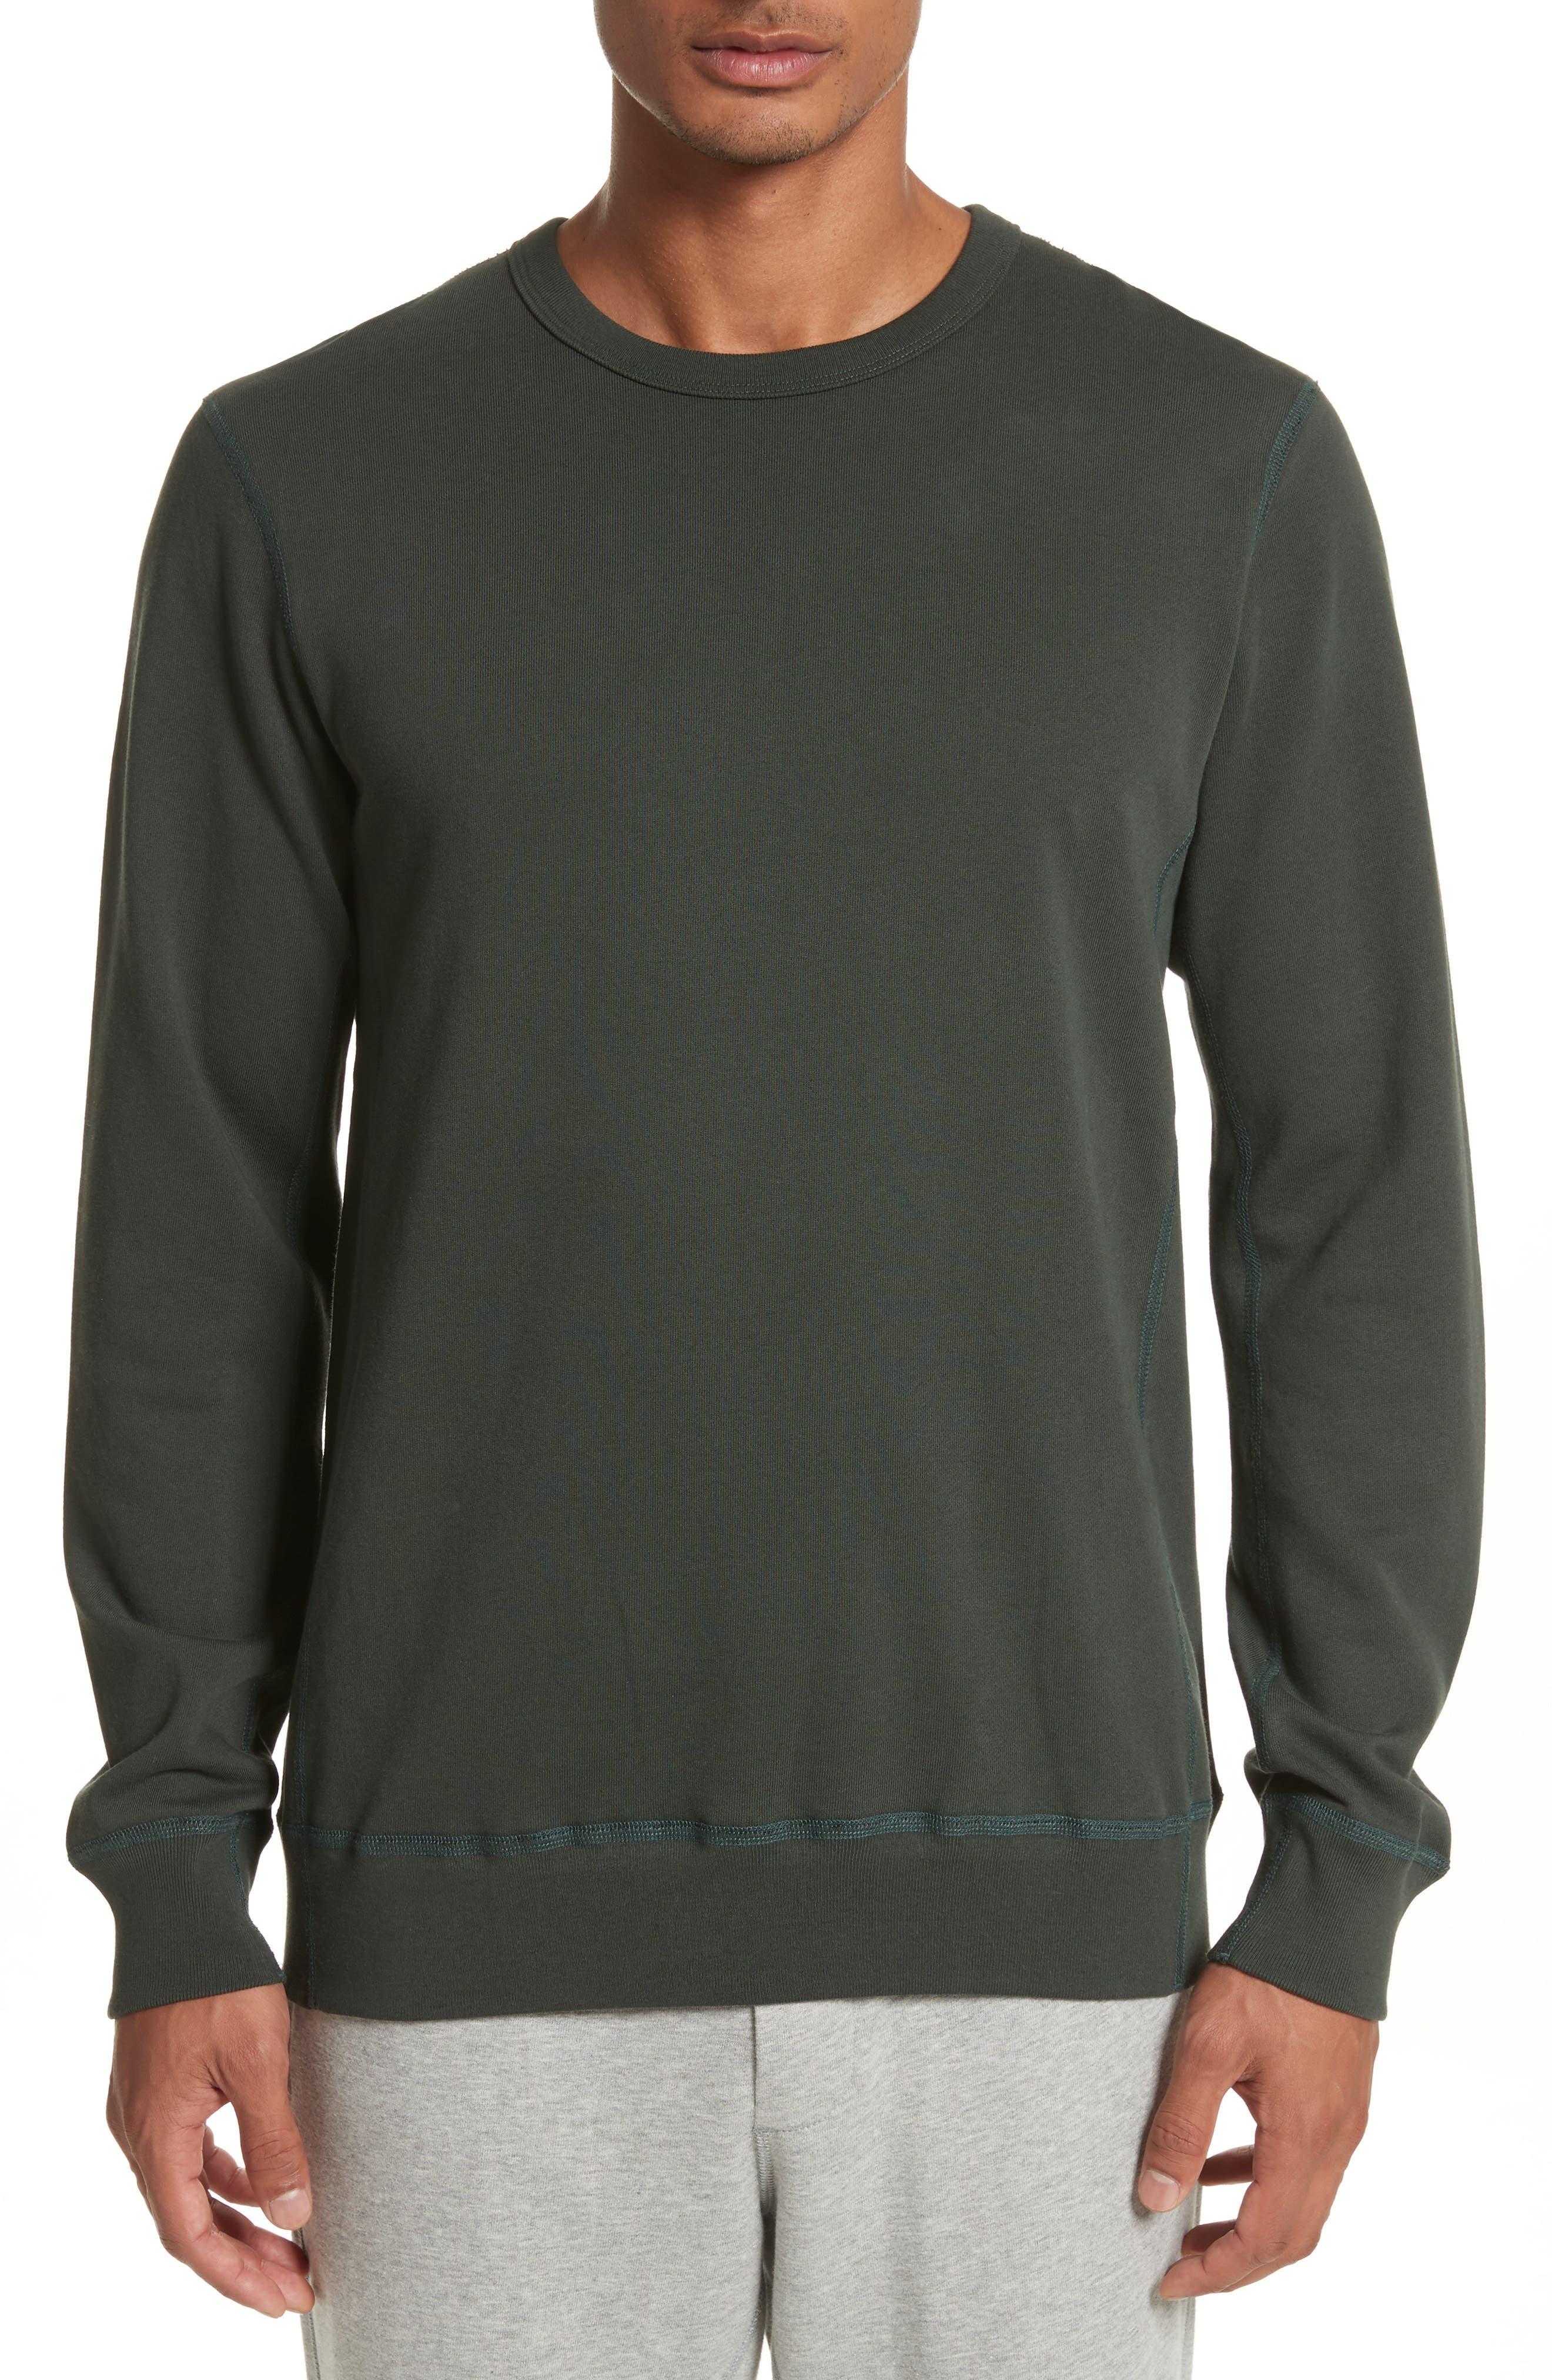 Crewneck Sweatshirt,                             Main thumbnail 1, color,                             Jungle Green